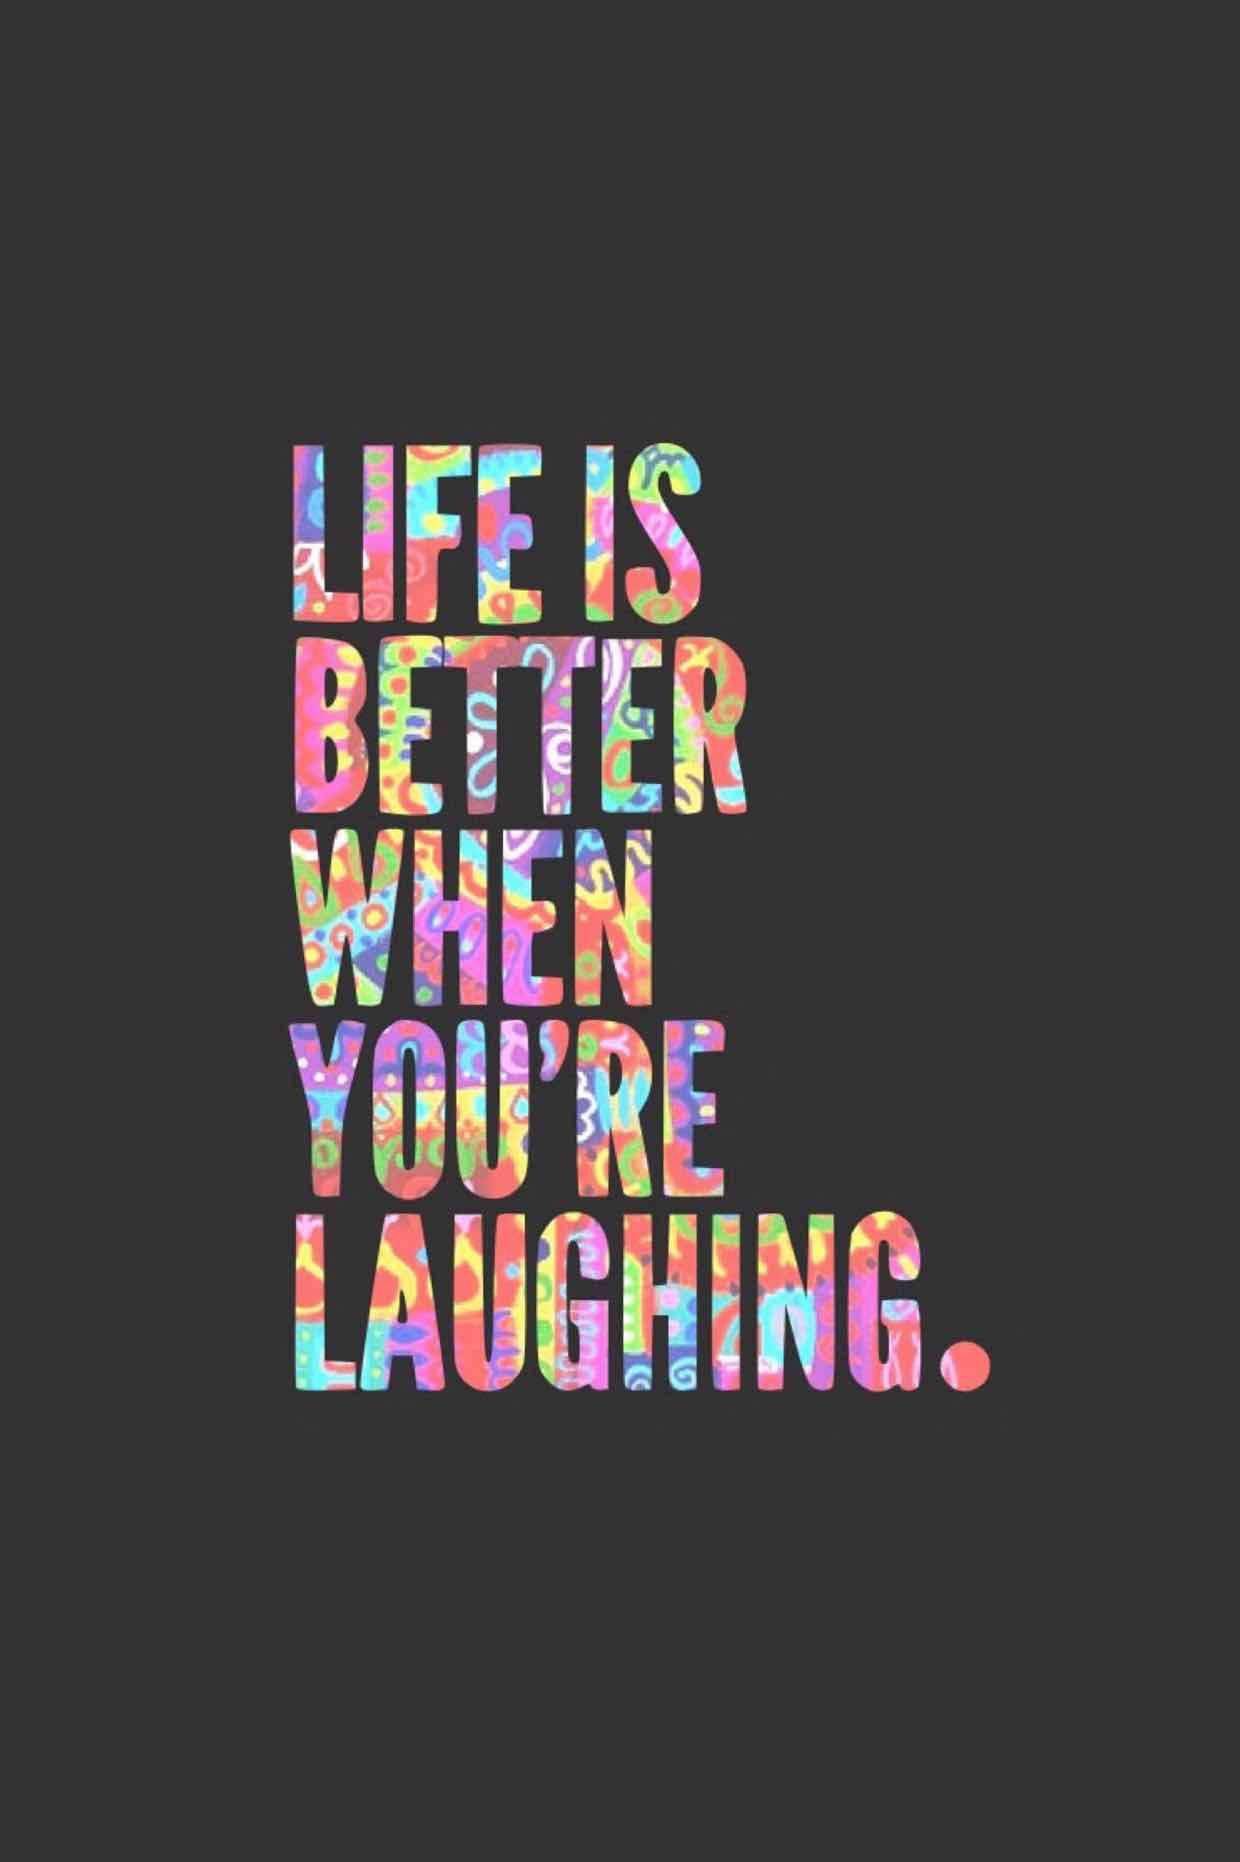 Quotes | Laughing quotes, Instagram quotes, Caption quotes